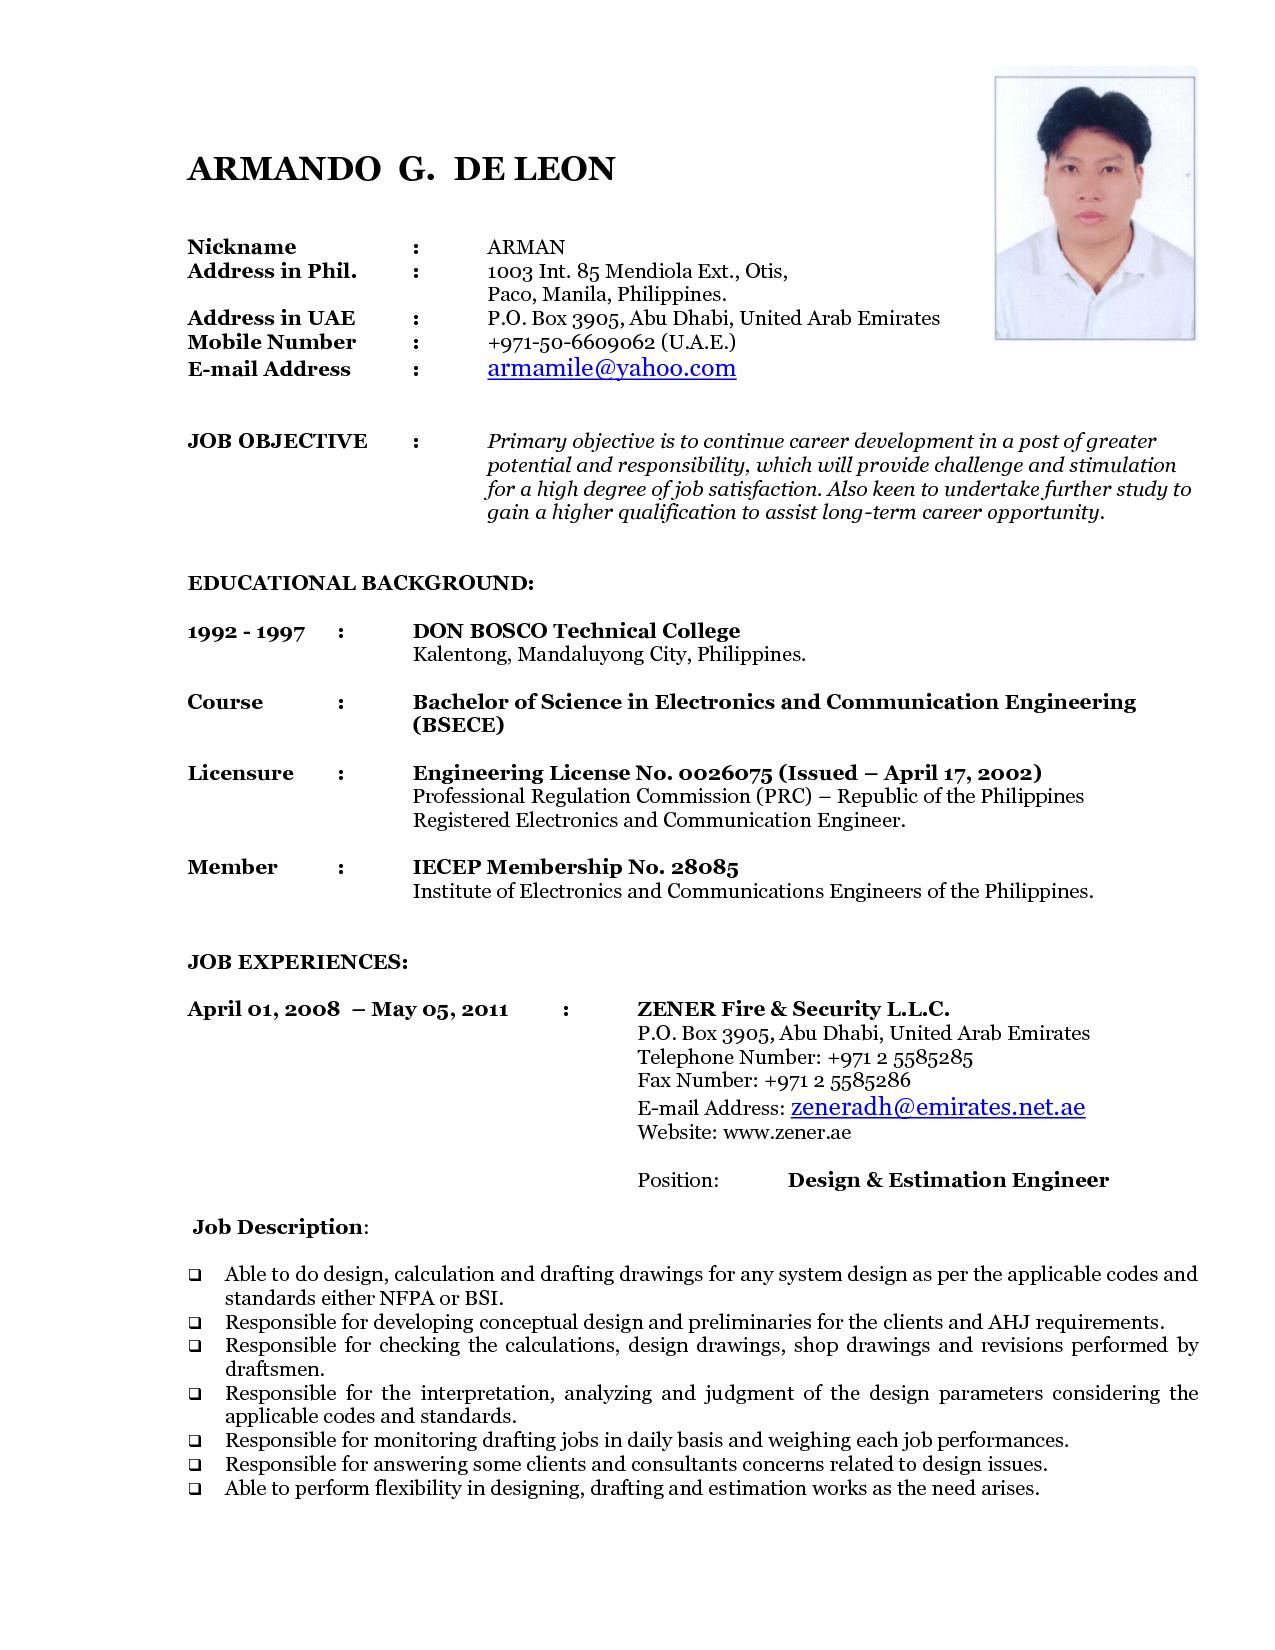 Resume Templates Latest Resume Templates Latest Resume Format Best Resume Format Resume Template Free